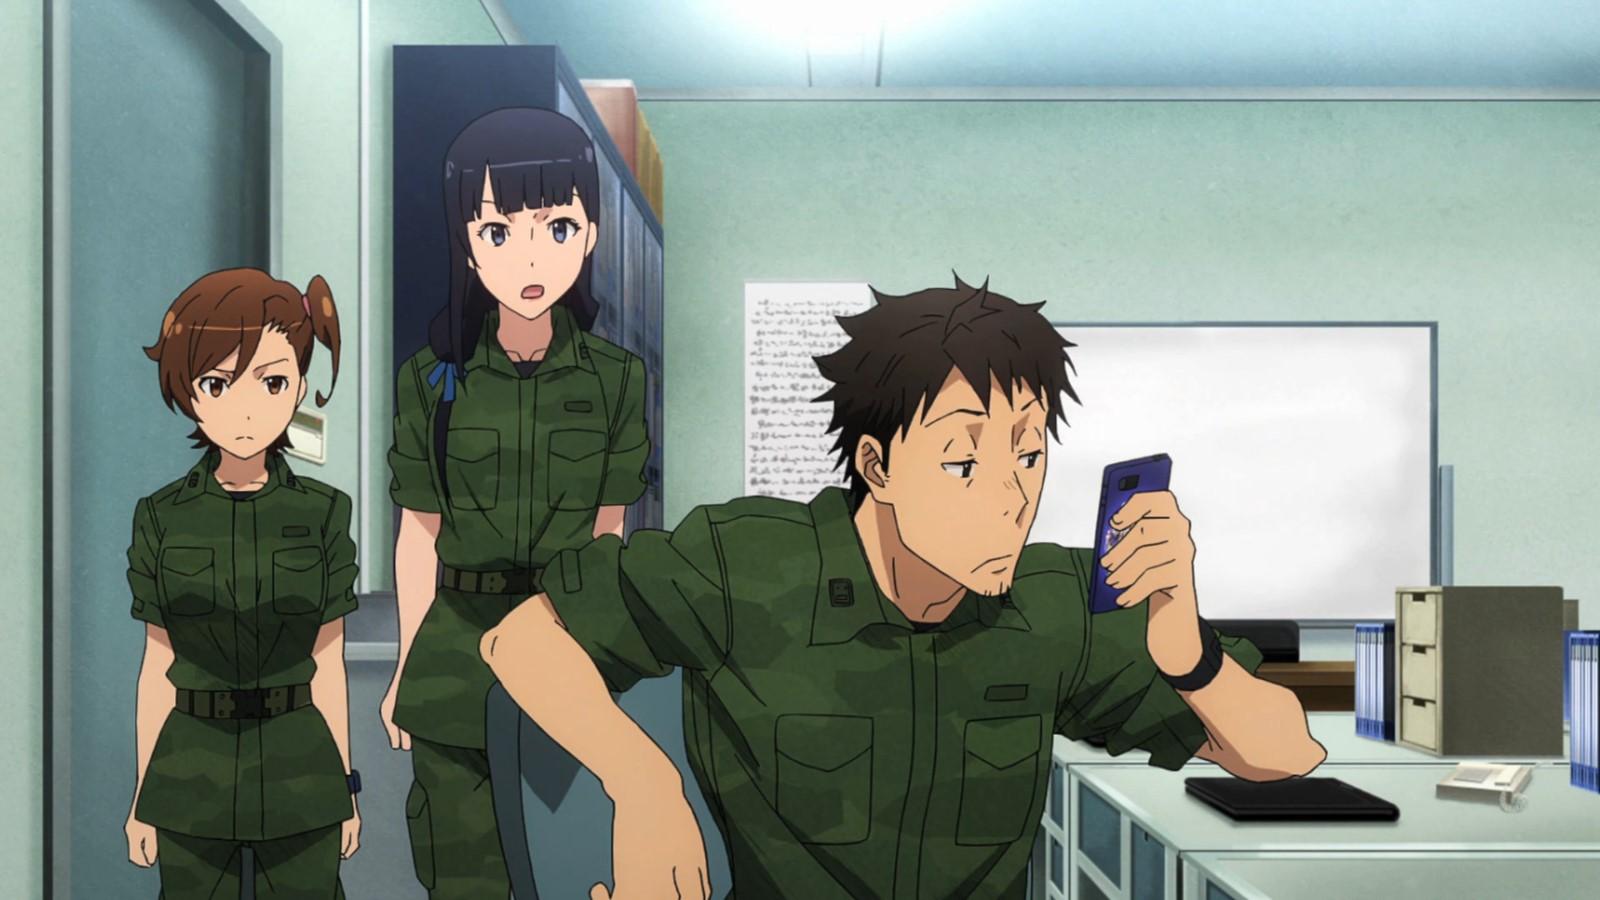 gate-anime-1-9-bentobyte.jpg